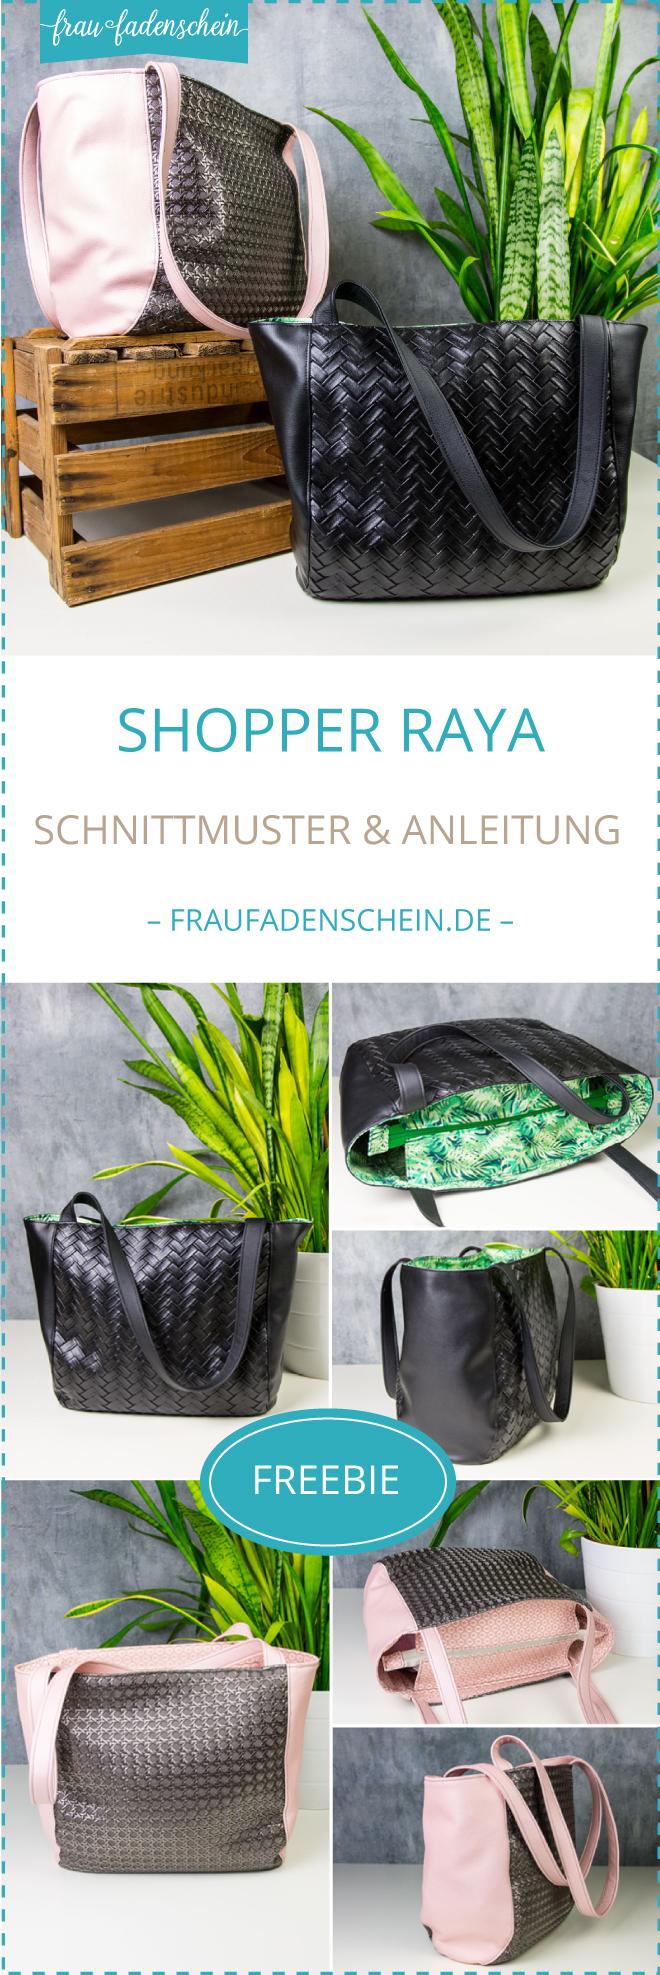 {Werbung} Kostenloses Schnittmuster: Shopper Raya